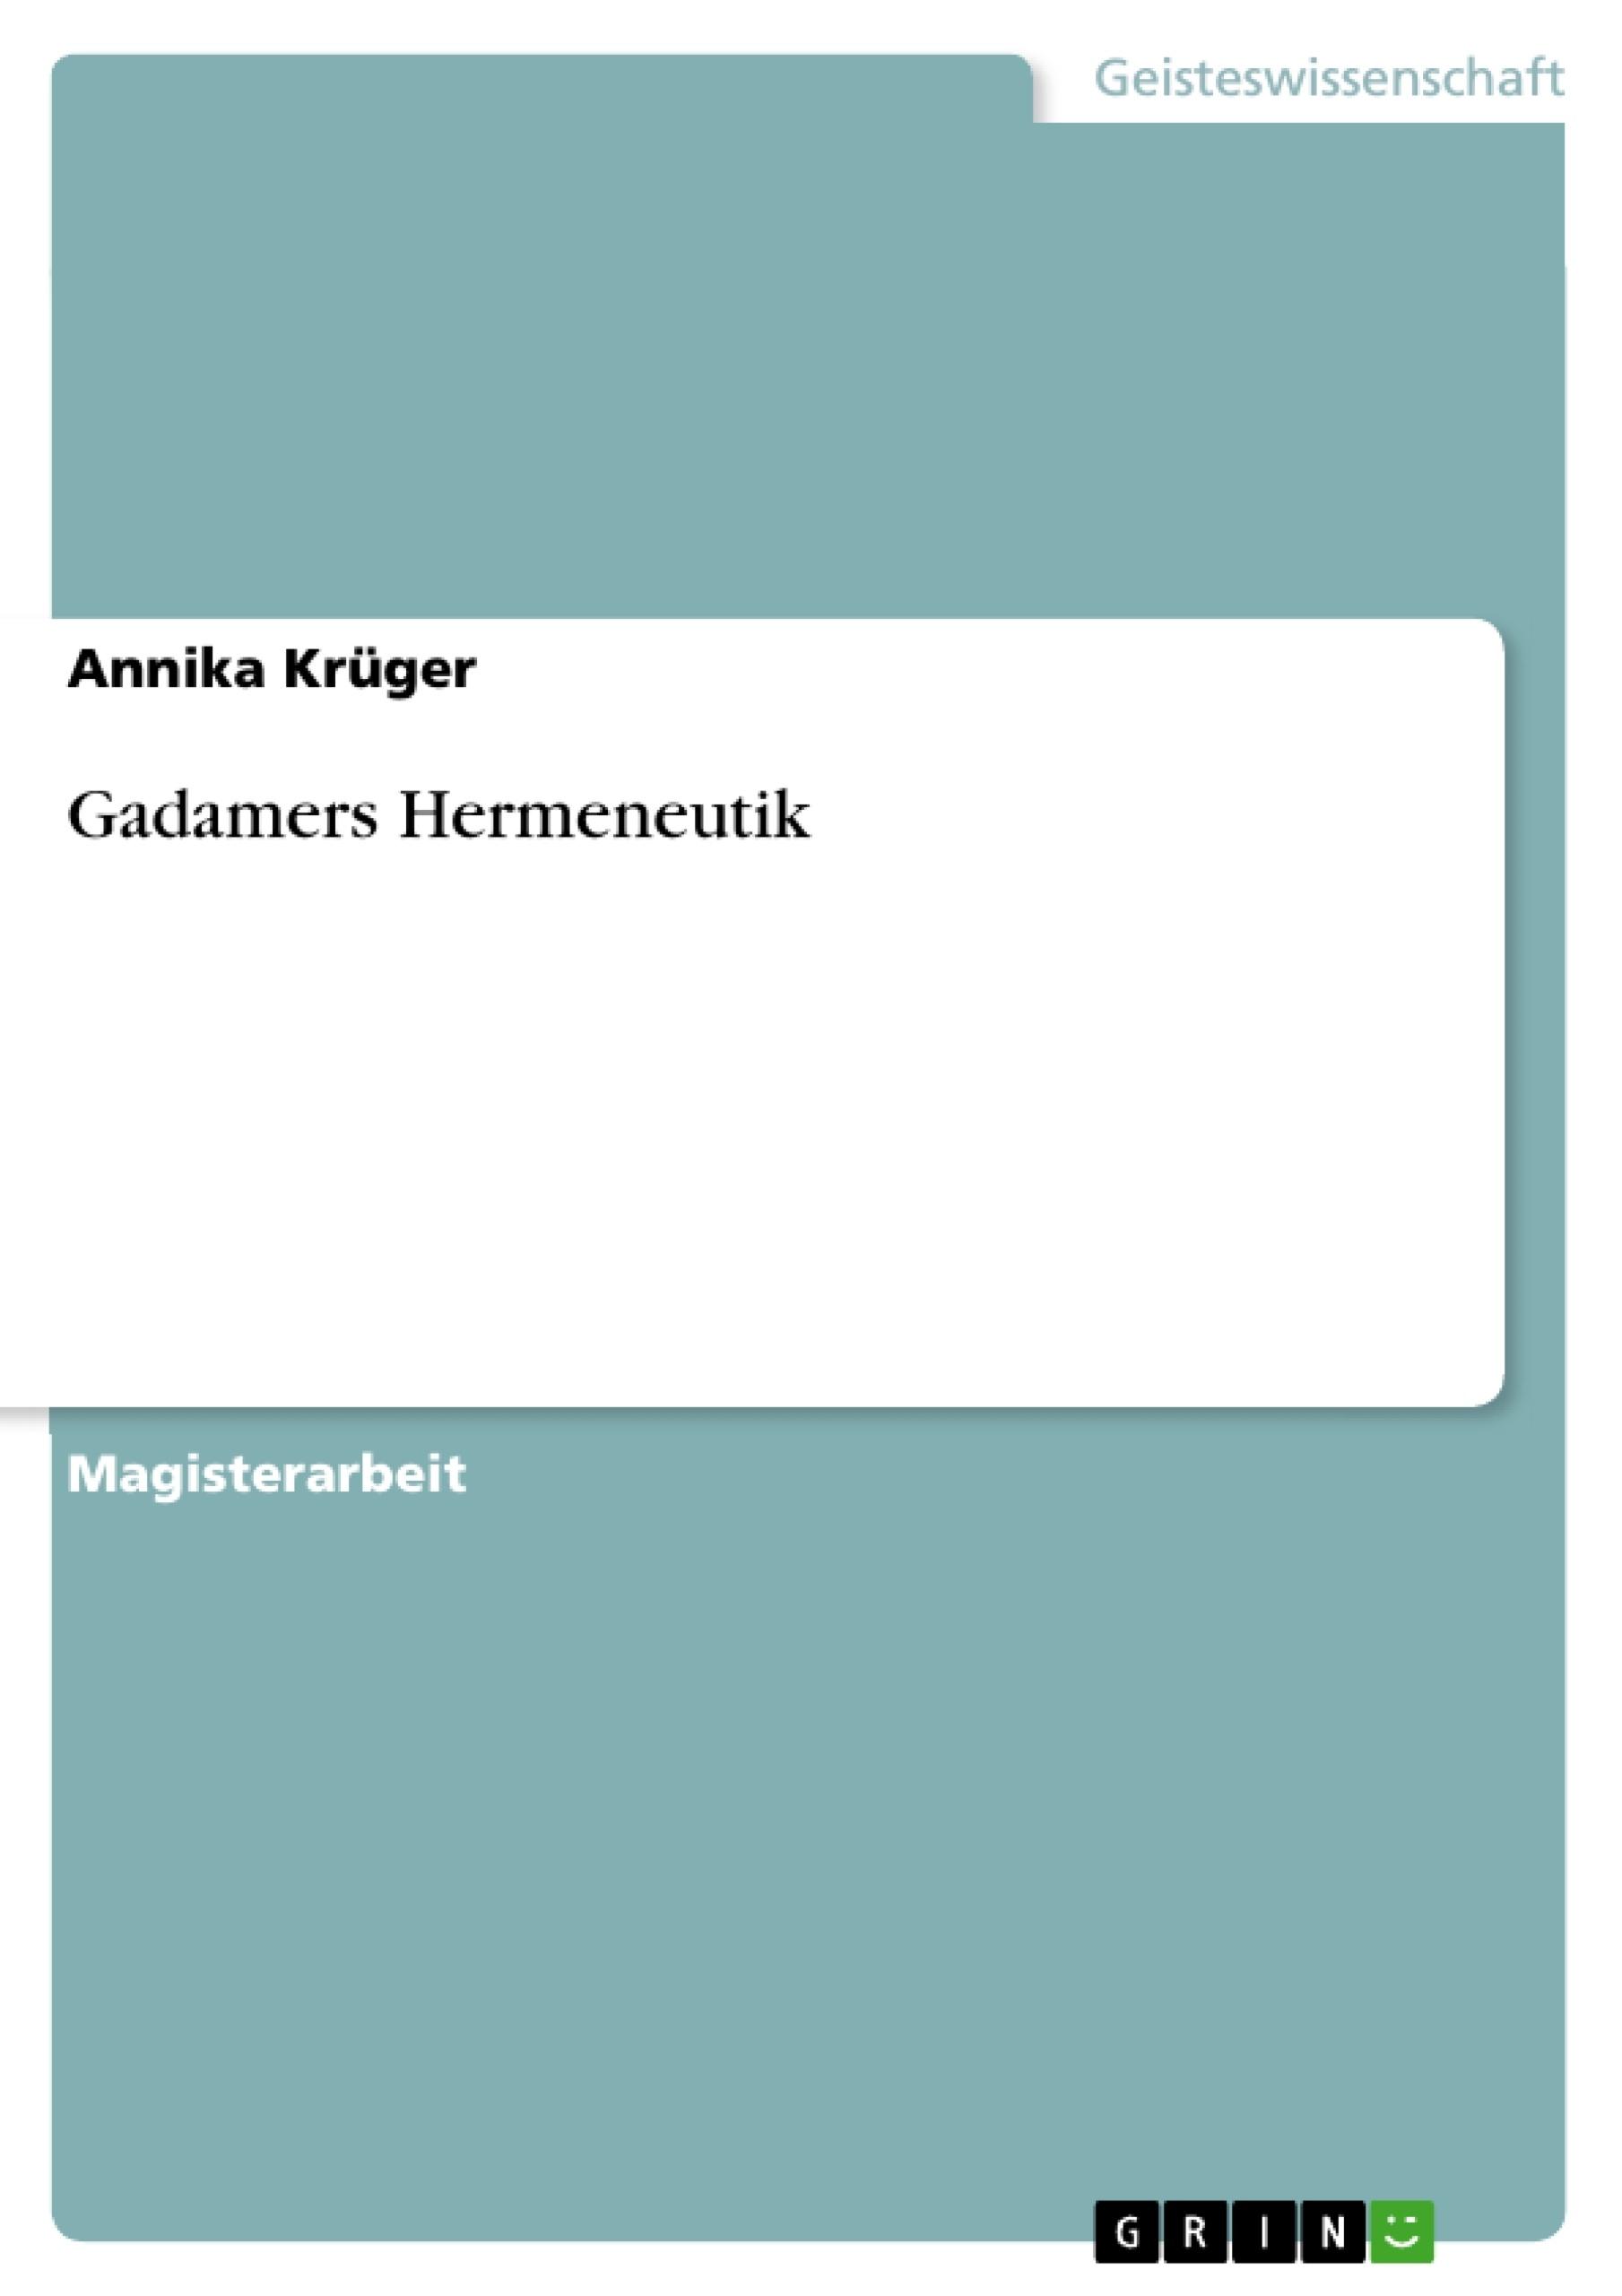 Titel: Gadamers Hermeneutik